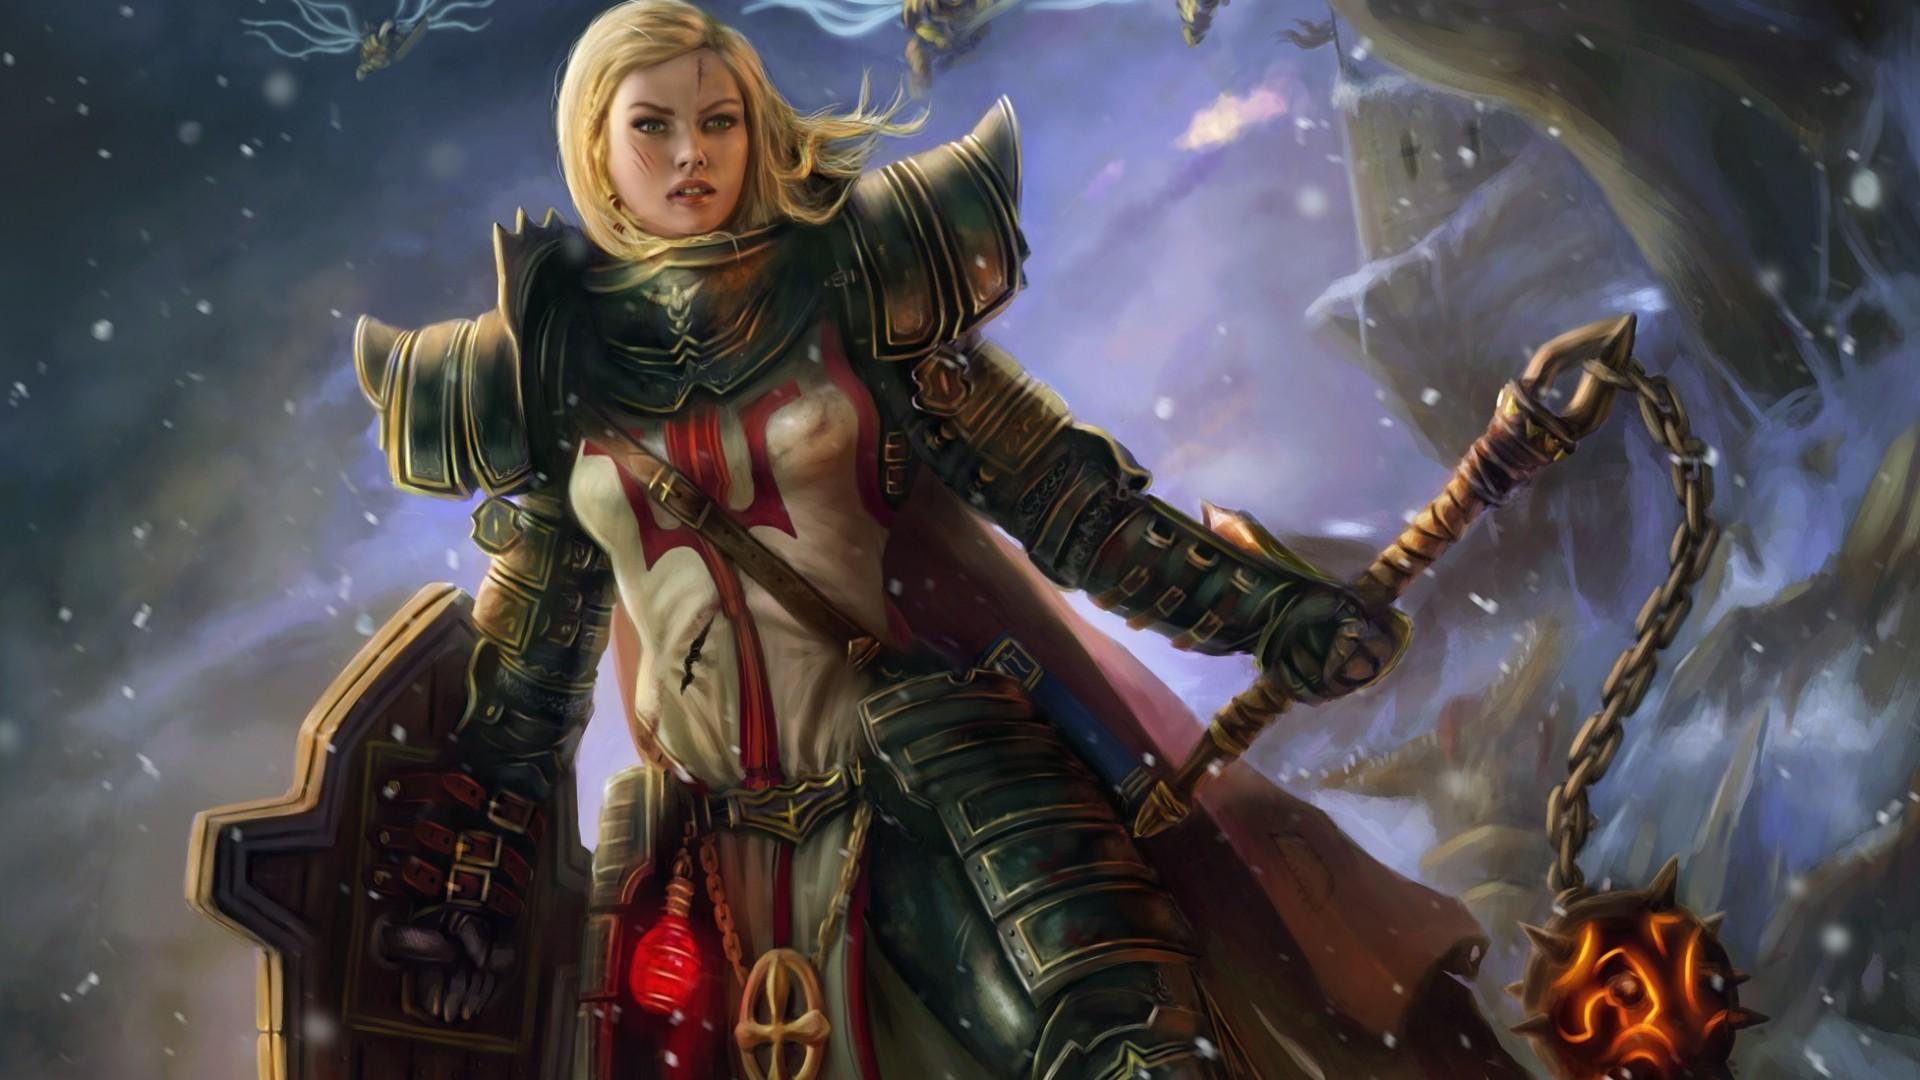 Diablo 3 Wallpaper 1 Download Free Stunning High Resolution